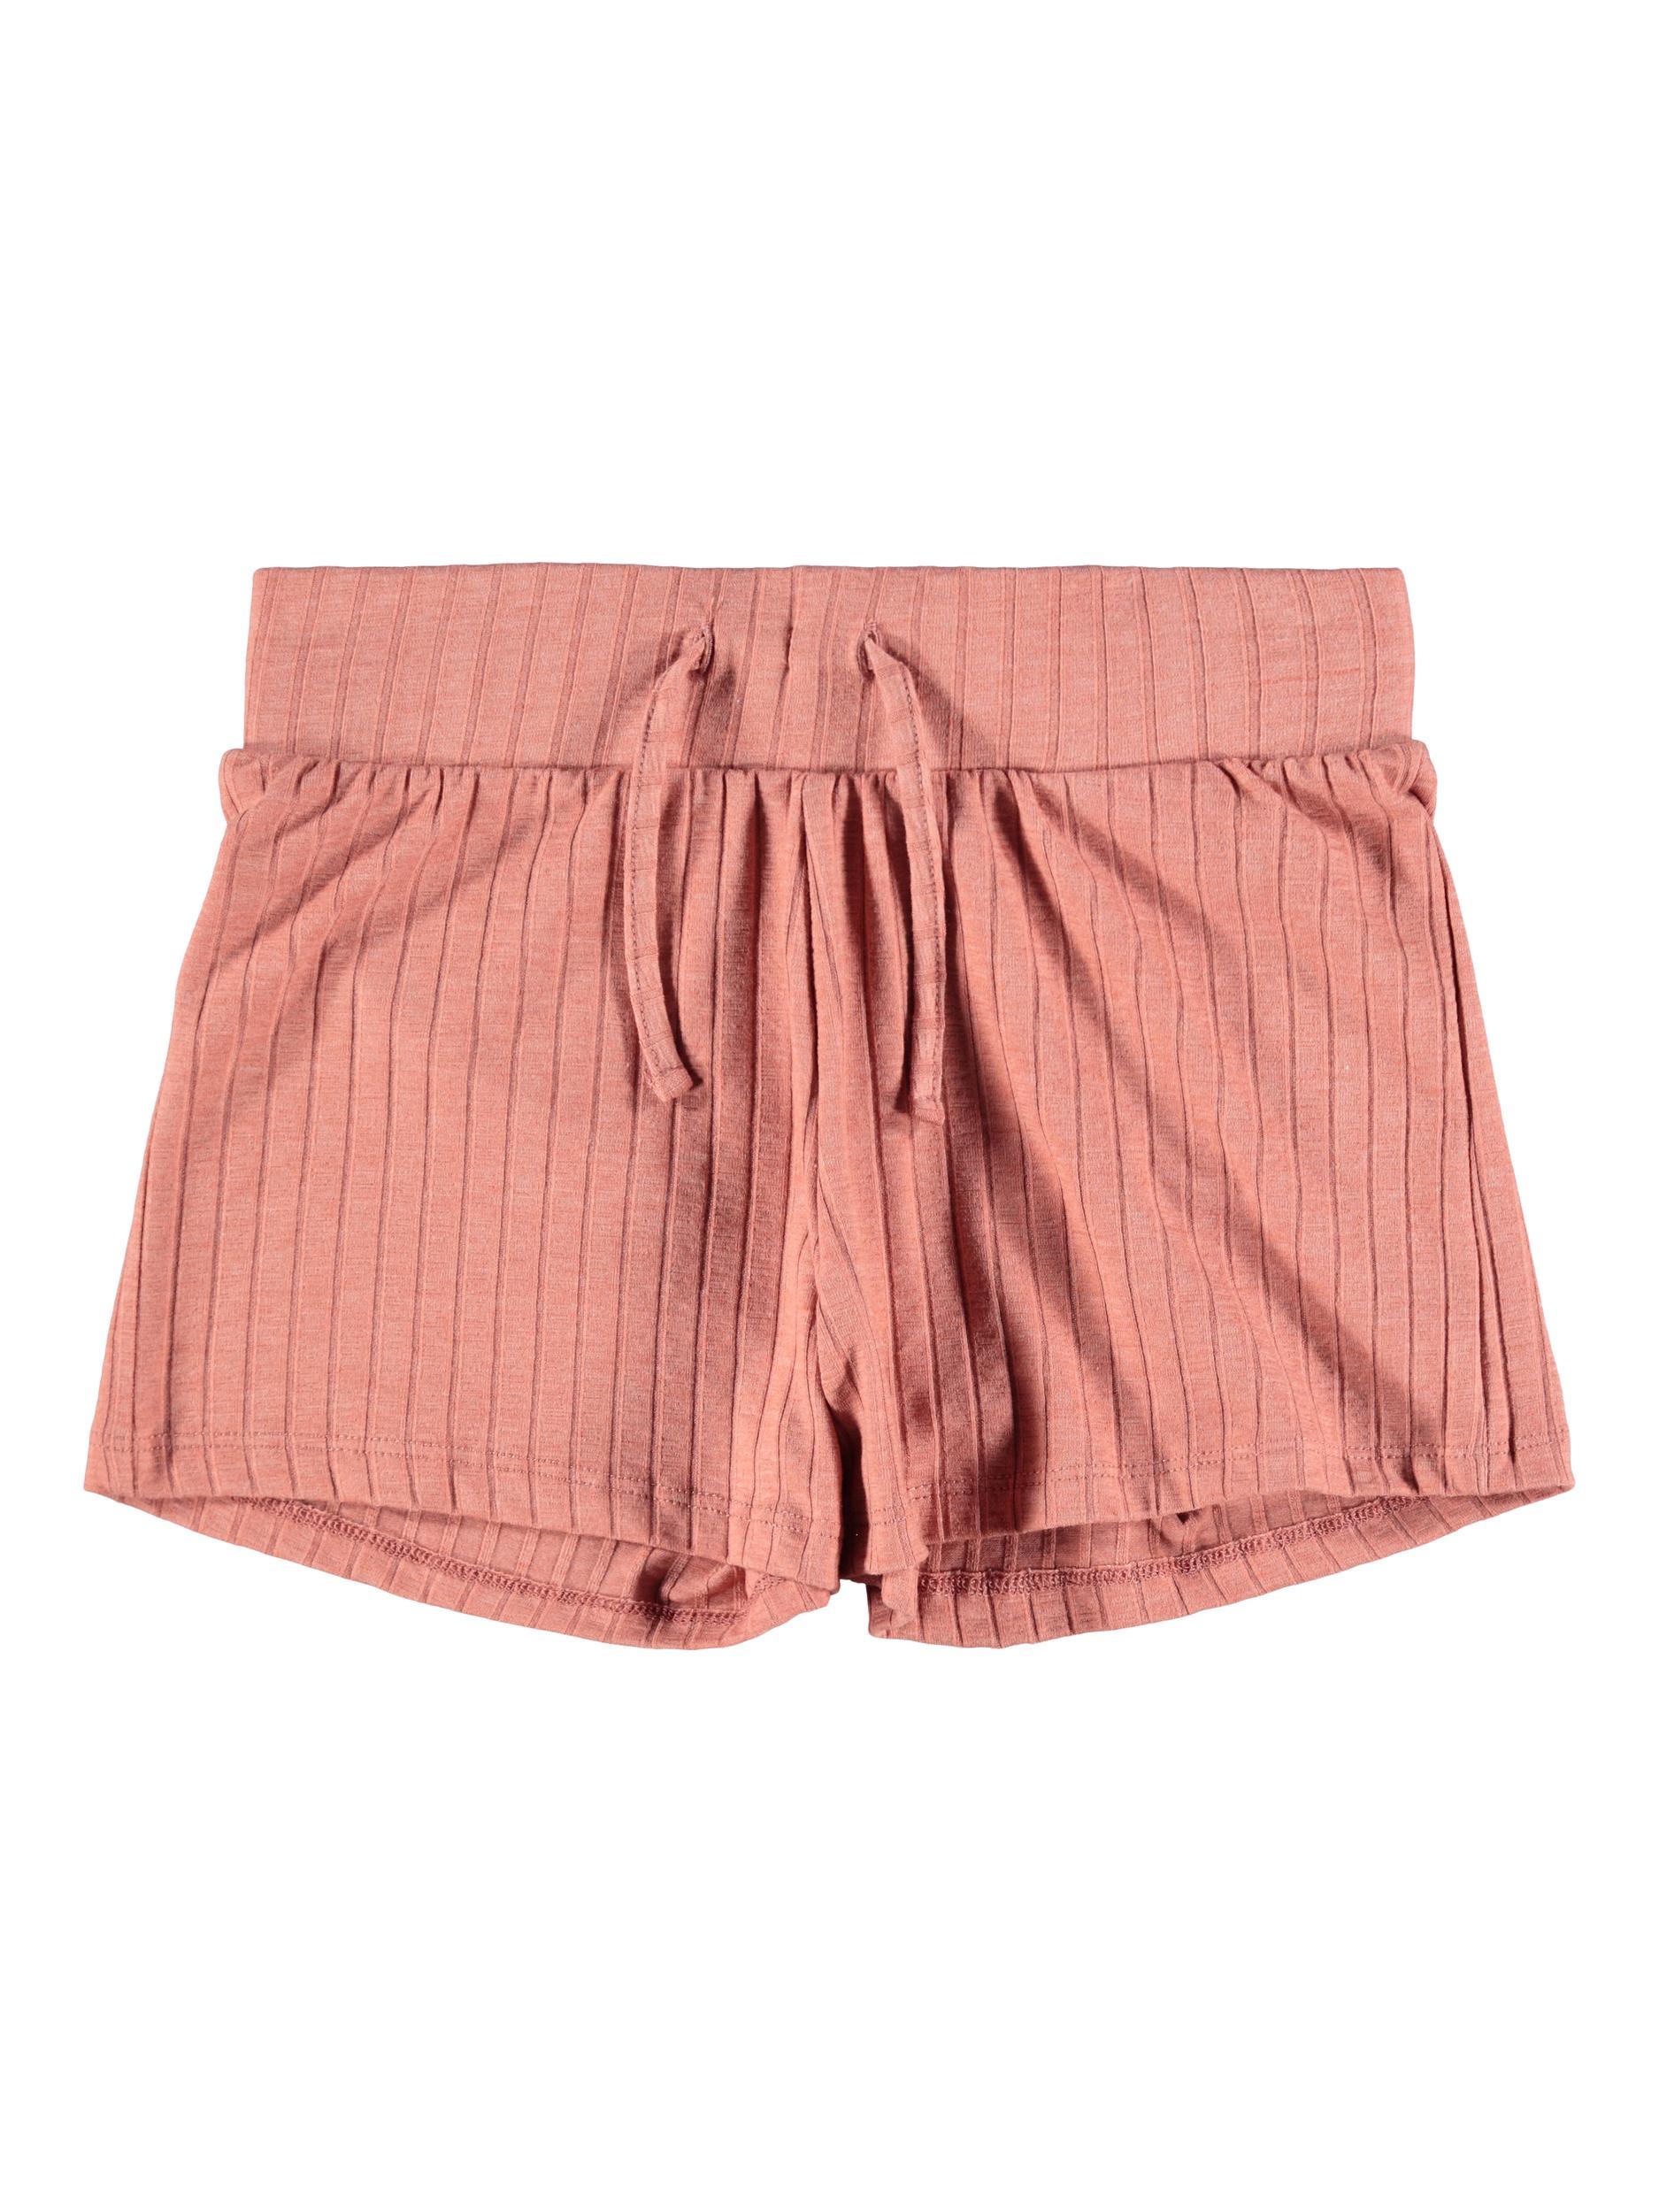 Name It Nola shorts